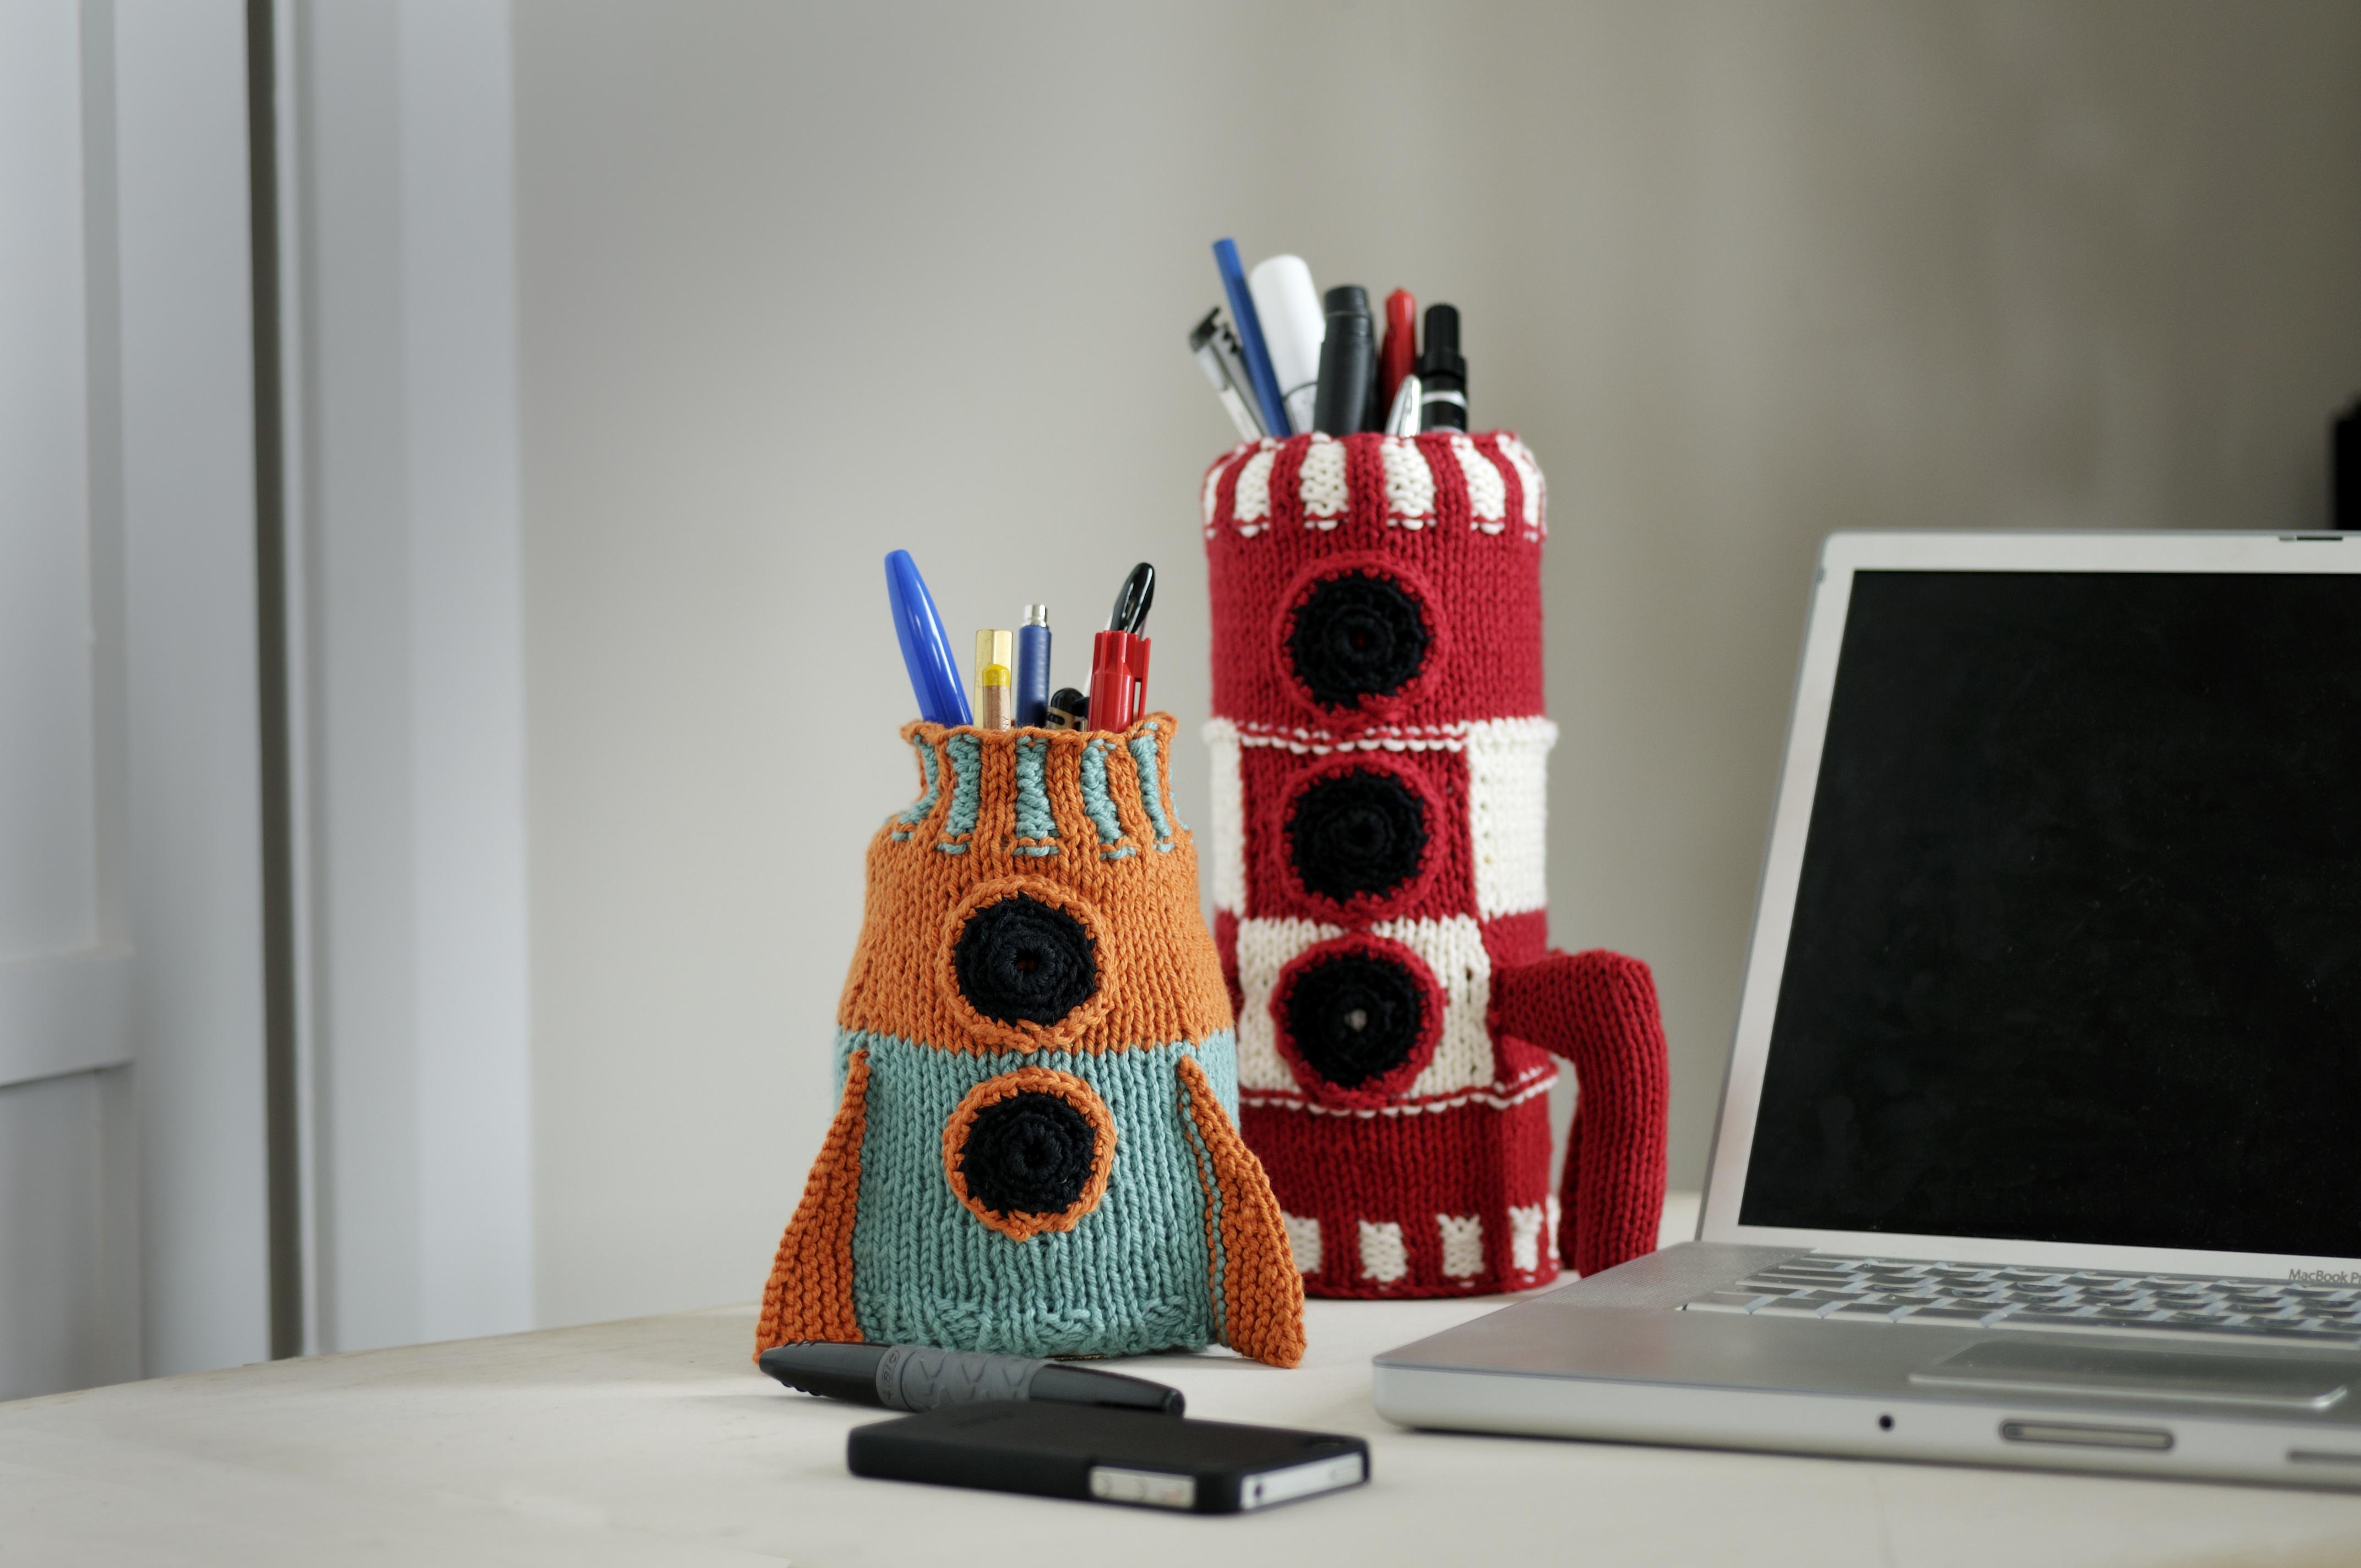 tech knits space rocket tidy